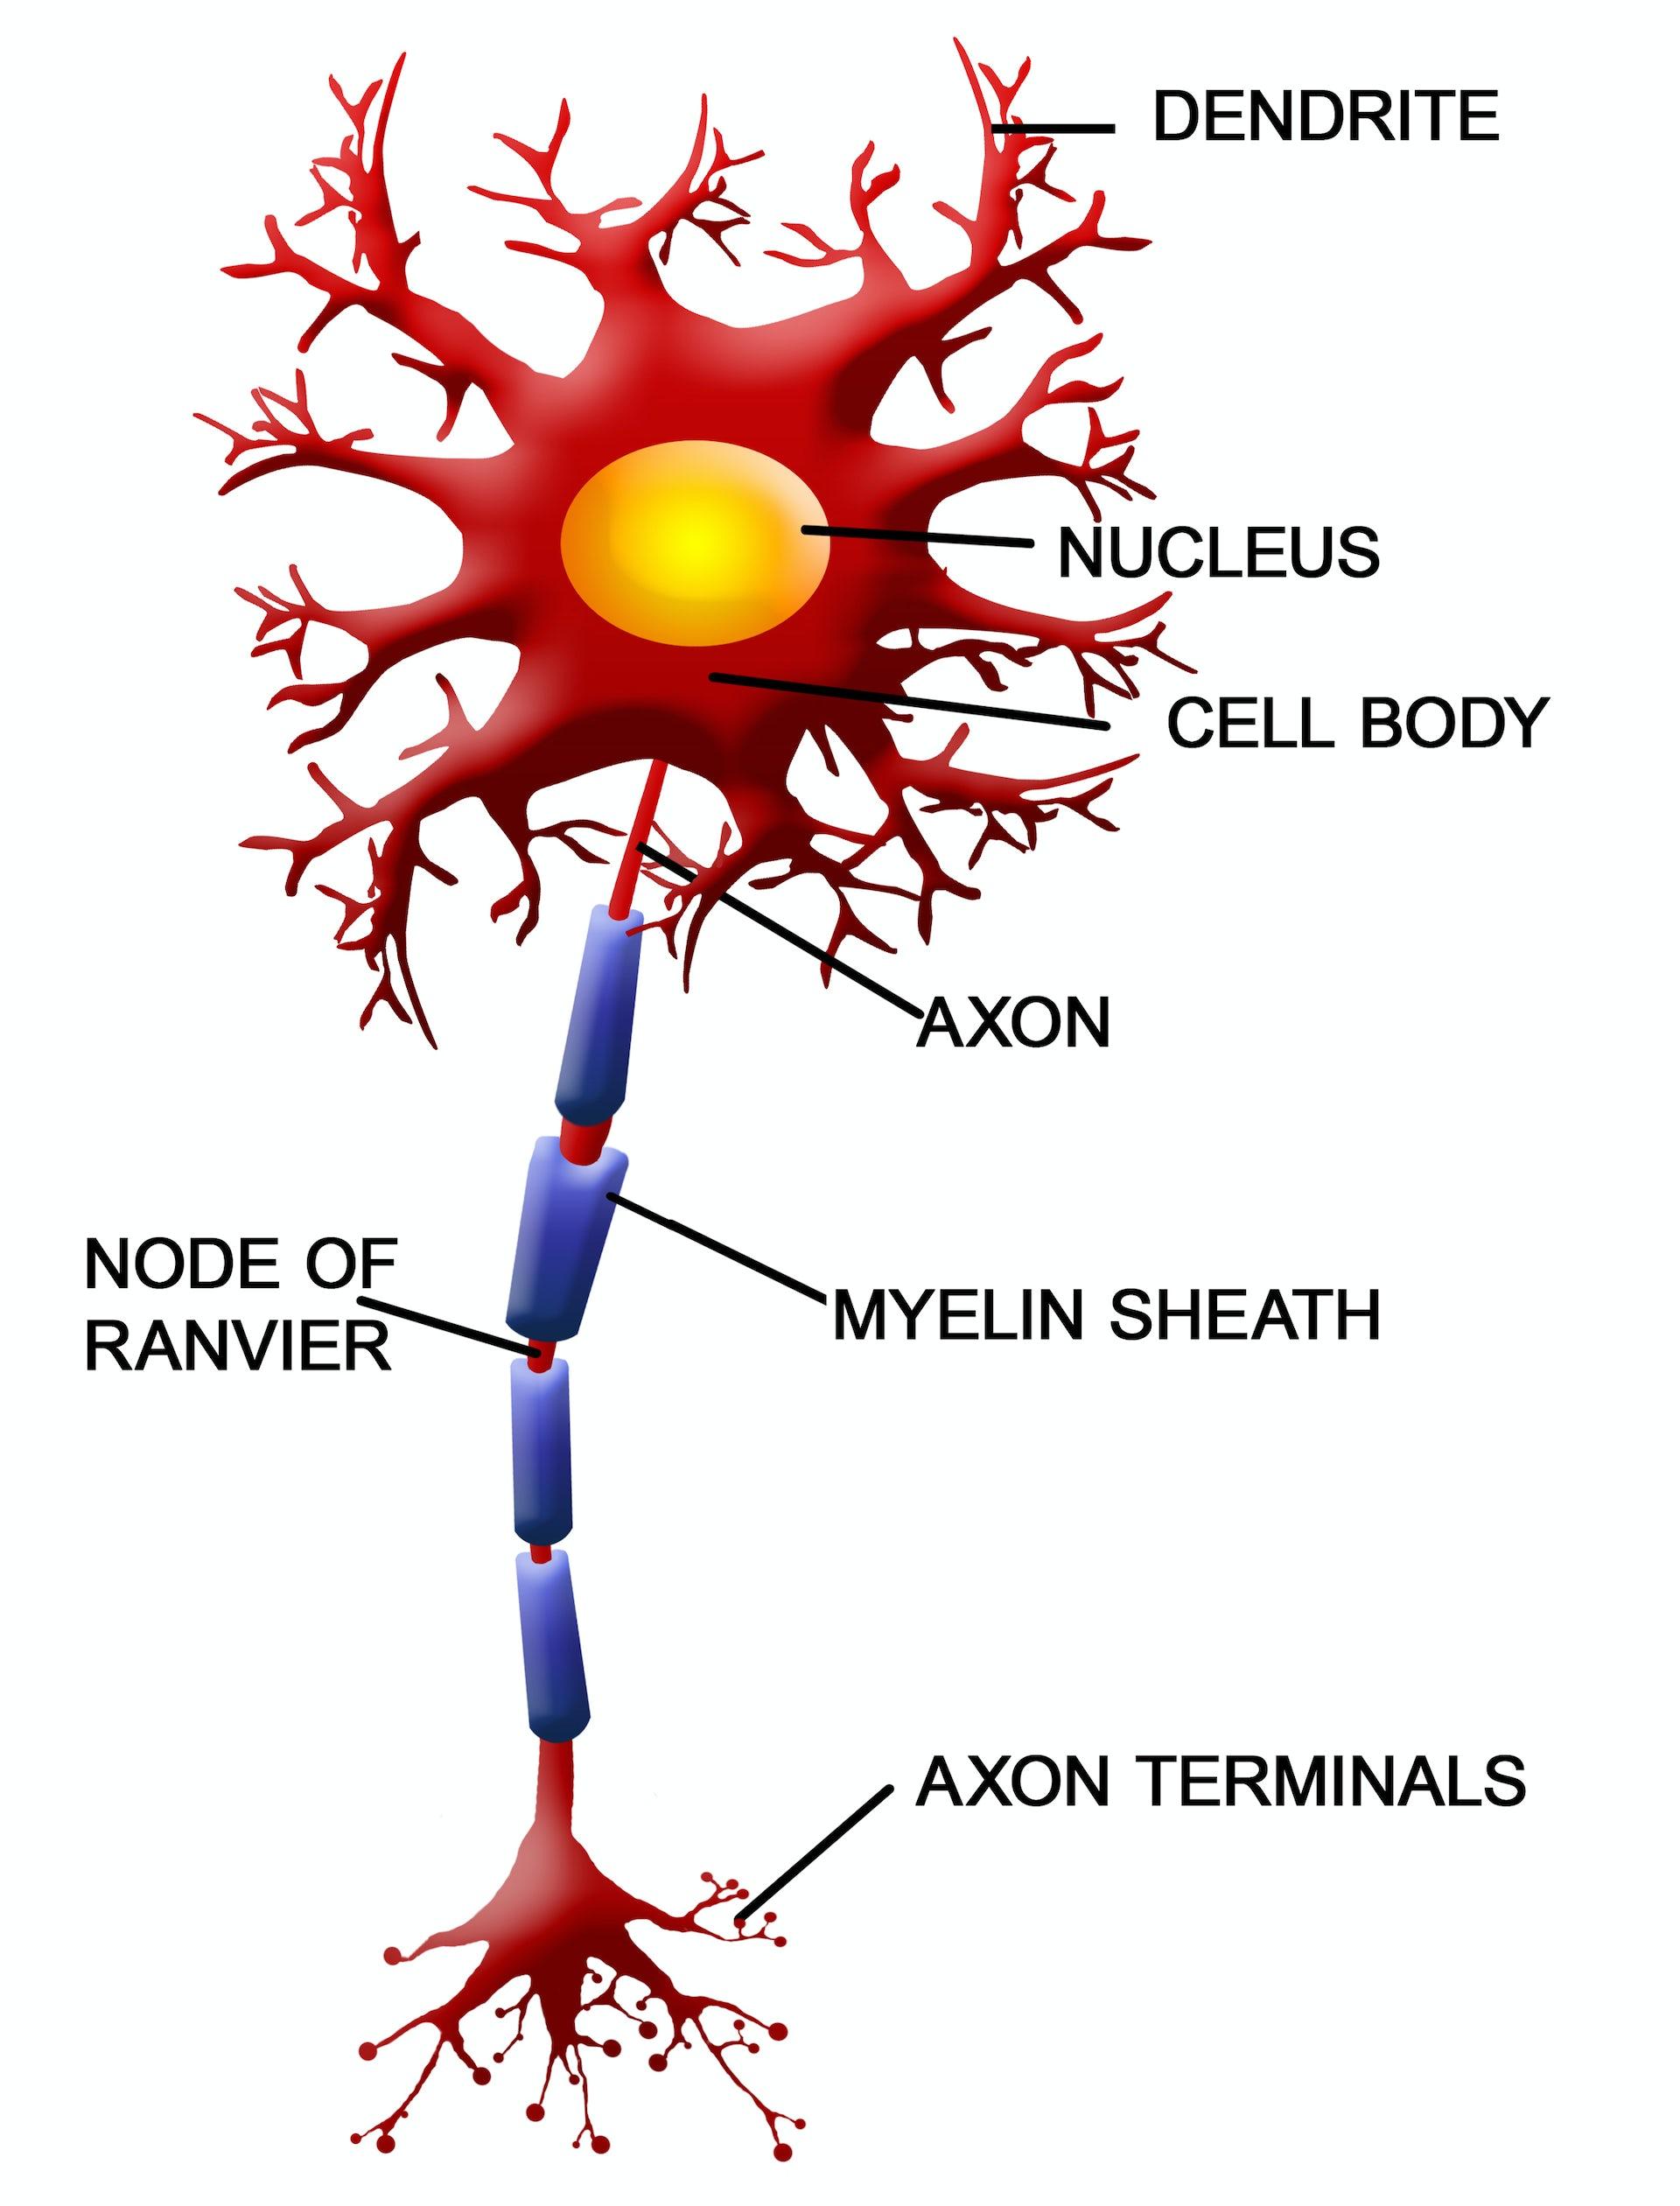 neuron diagram google 3 5 tridonicsignage de \u2022neuron diagram google best wiring library rh 92 ilahidinle be brain diagram basic neuron diagram